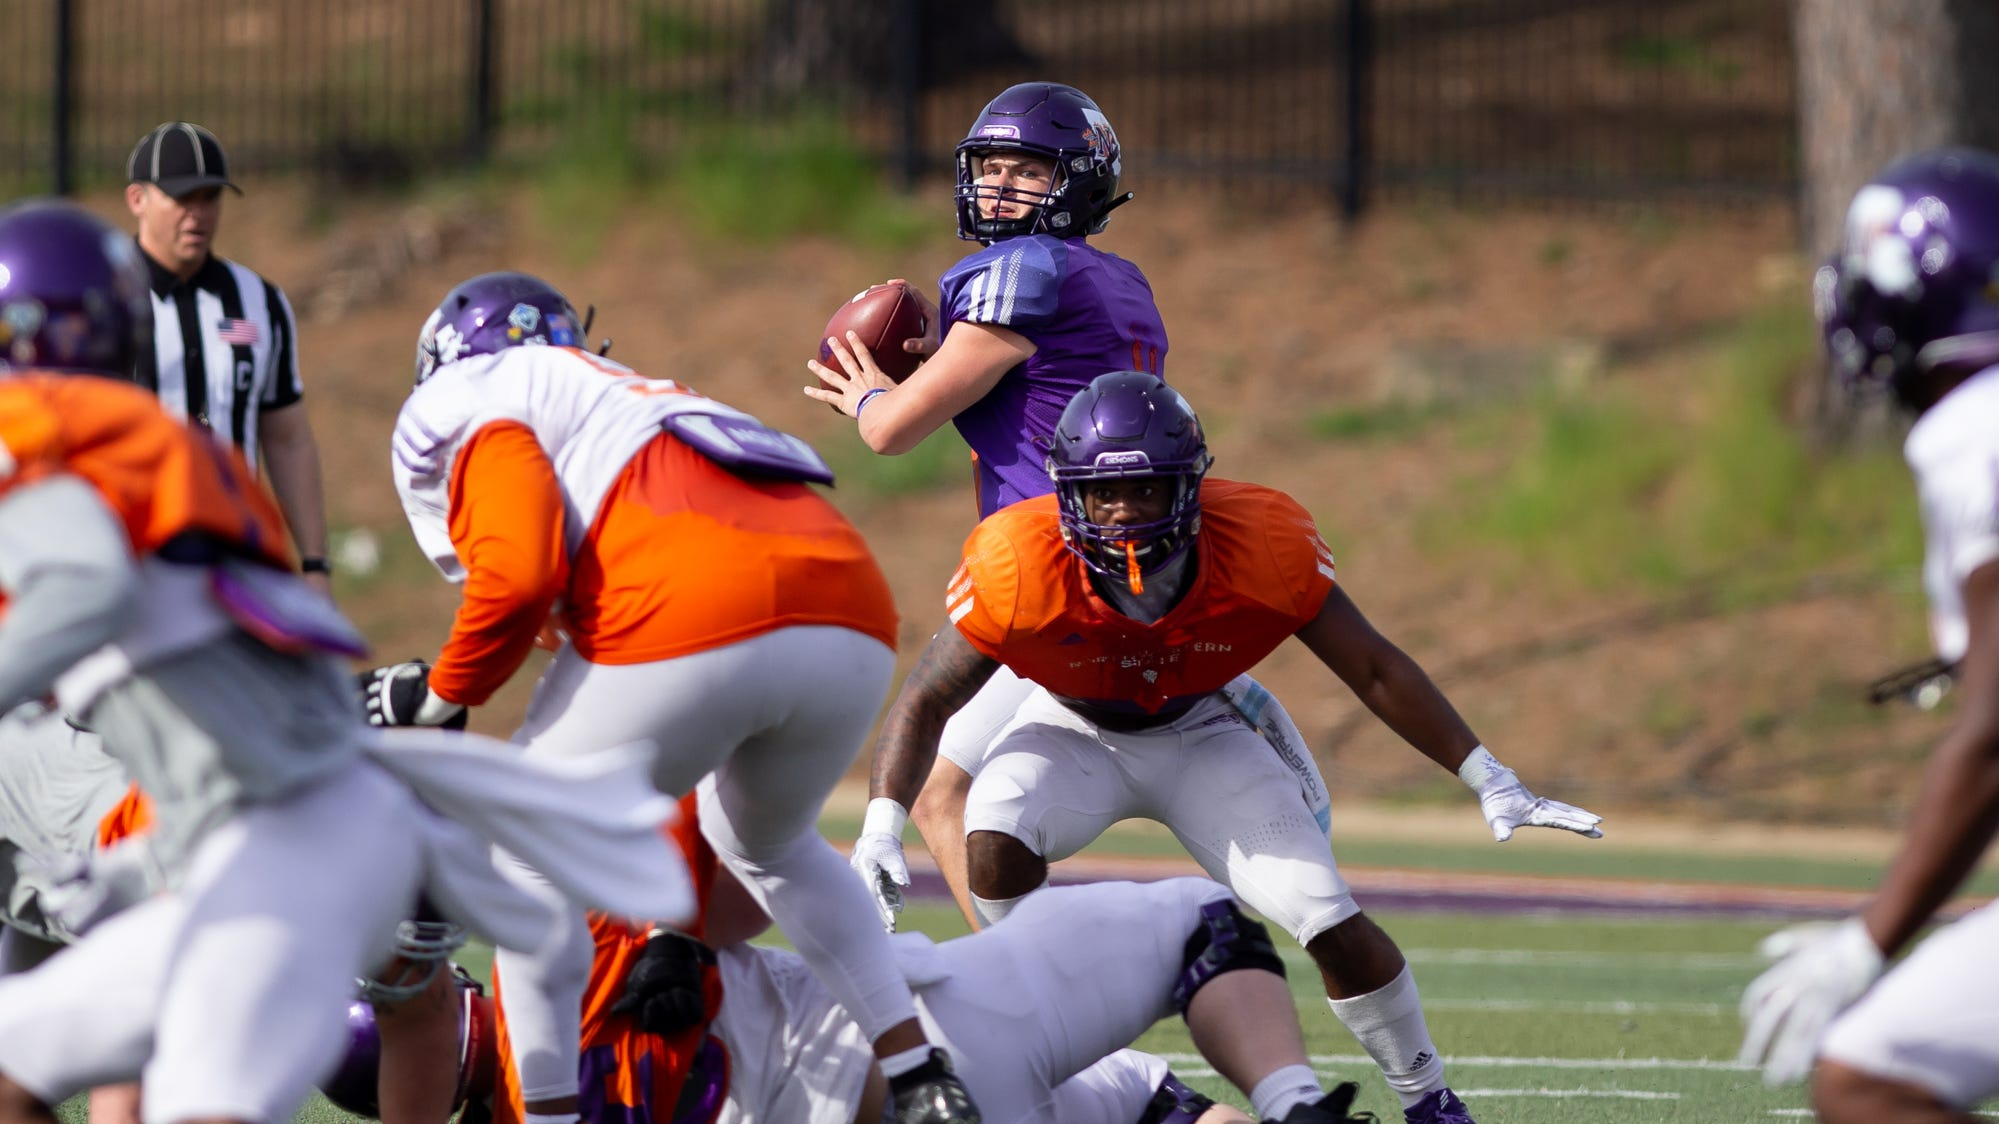 NSU quarterback Shelton Eppler looks to throw during Saturday's scrimmage.